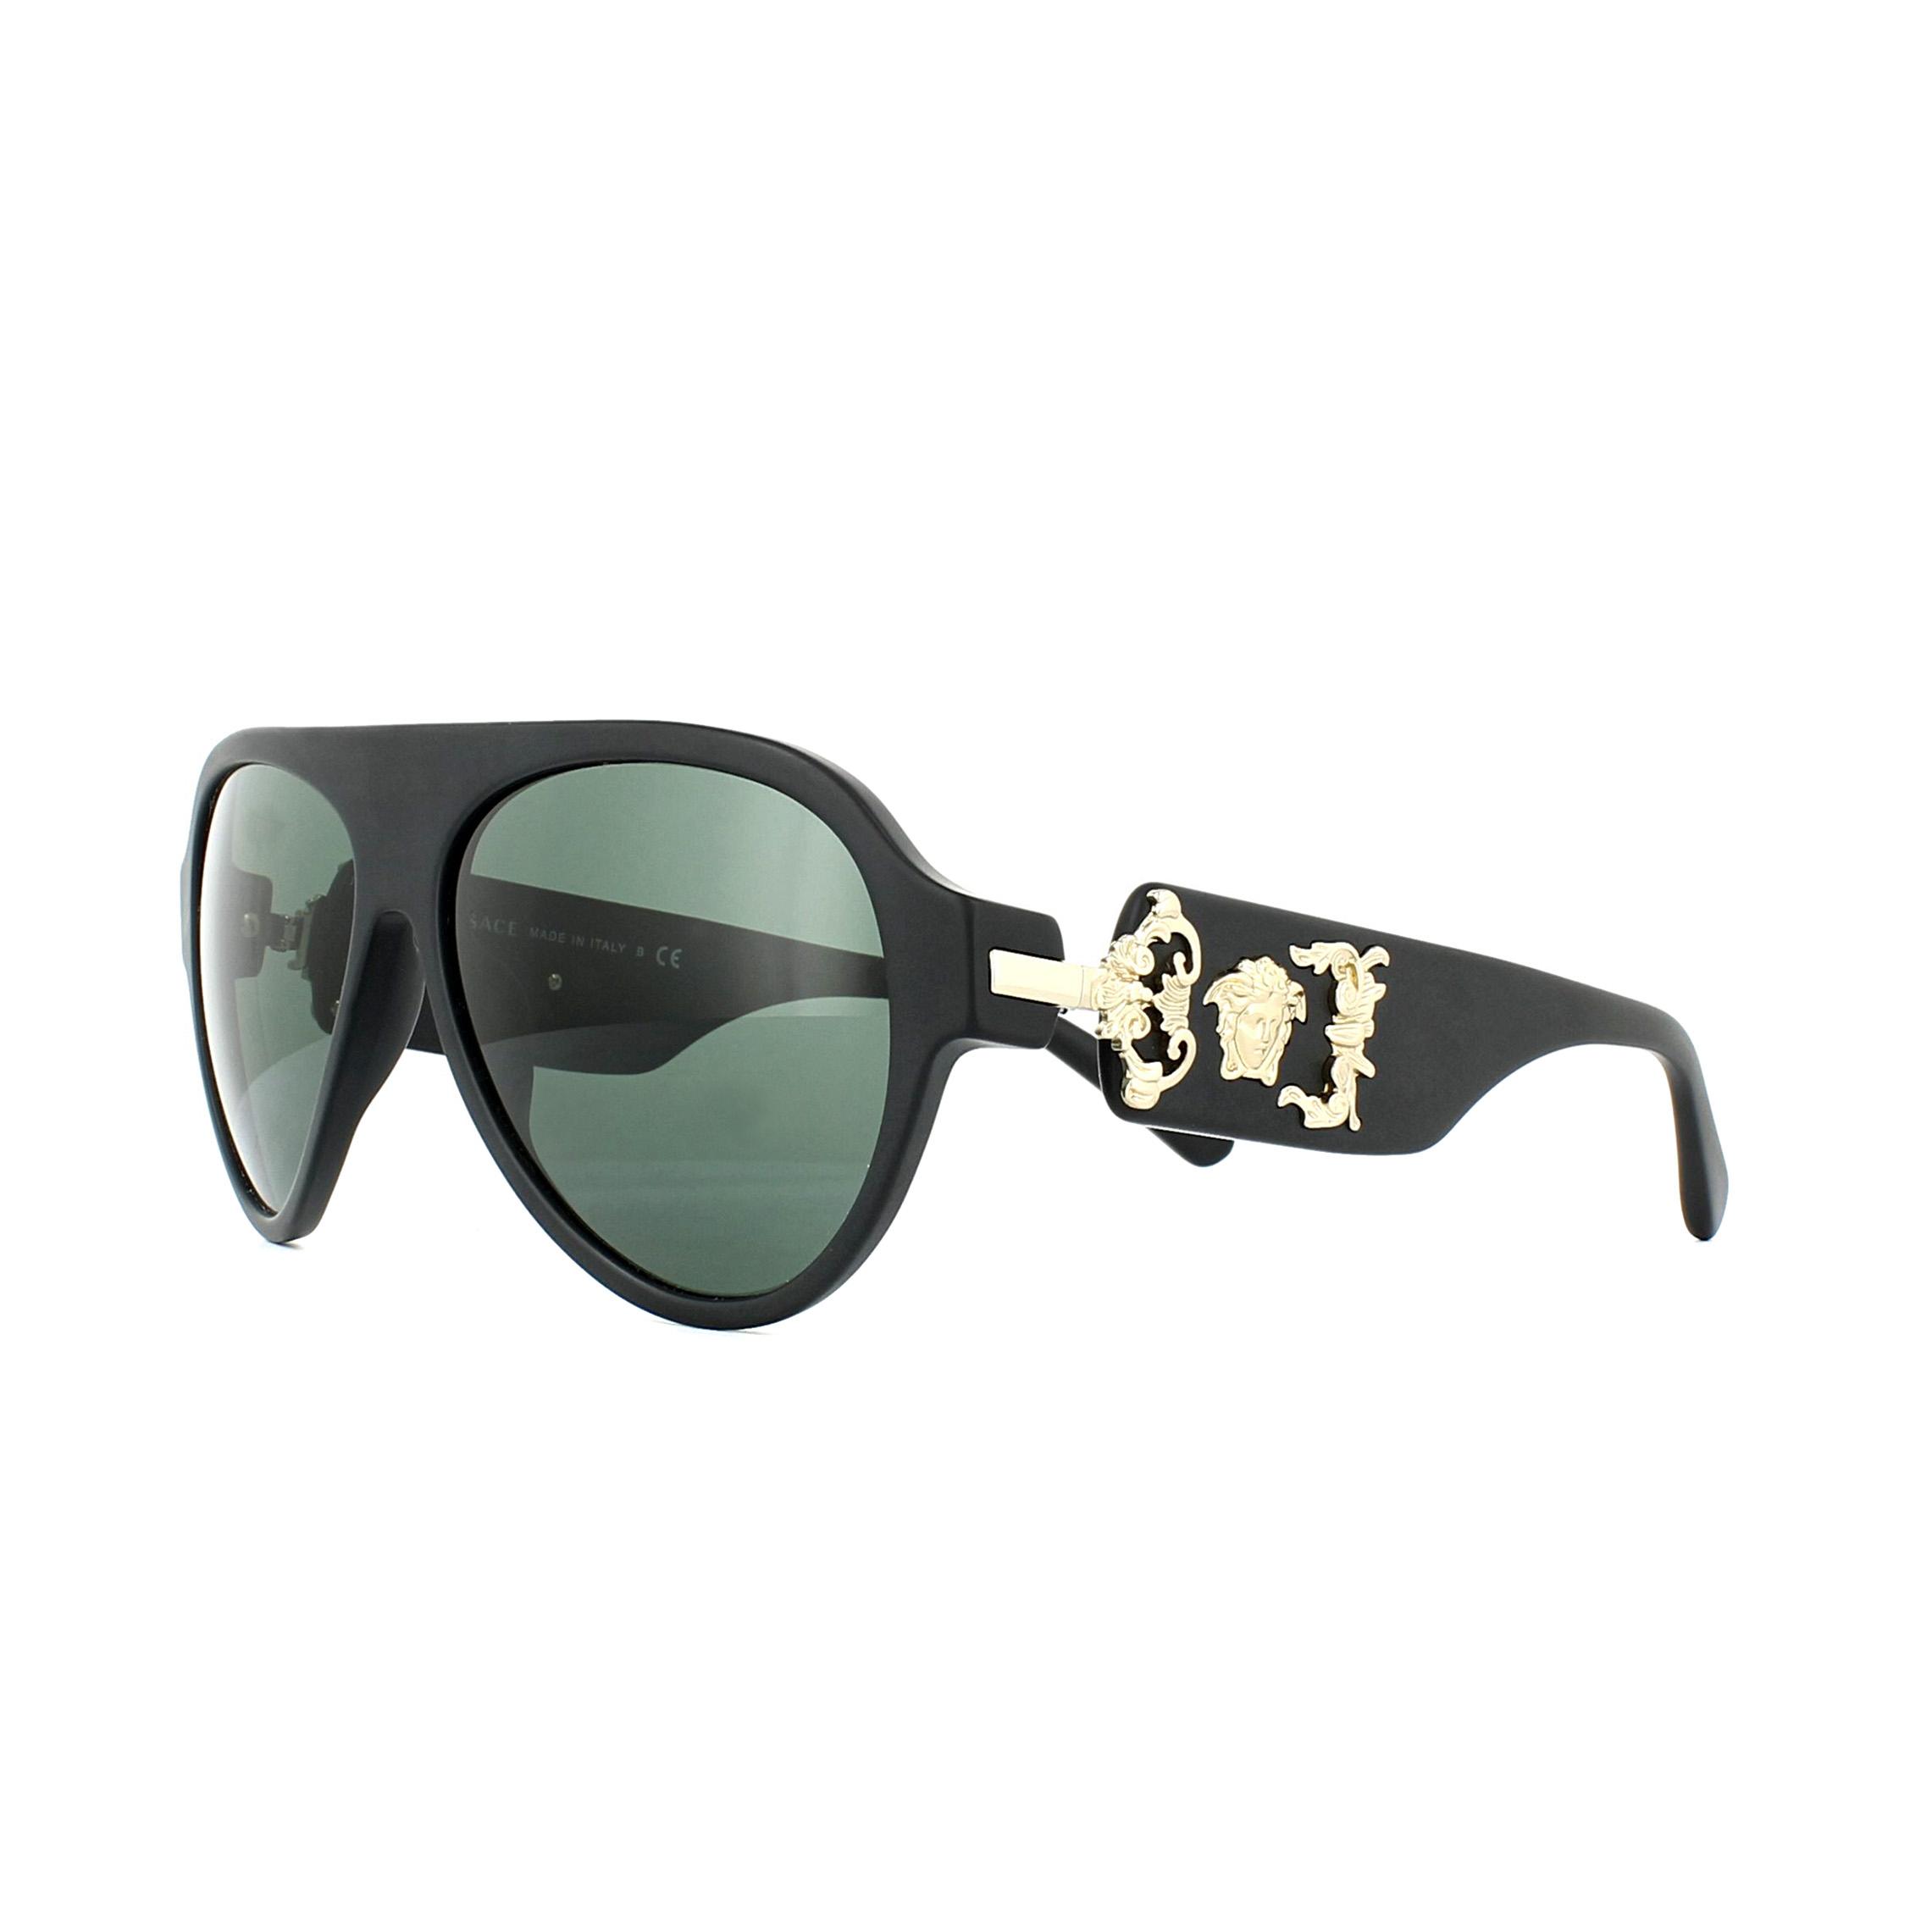 7fd12e819f66 Cheap Versace 4323 Sunglasses - Discounted Sunglasses